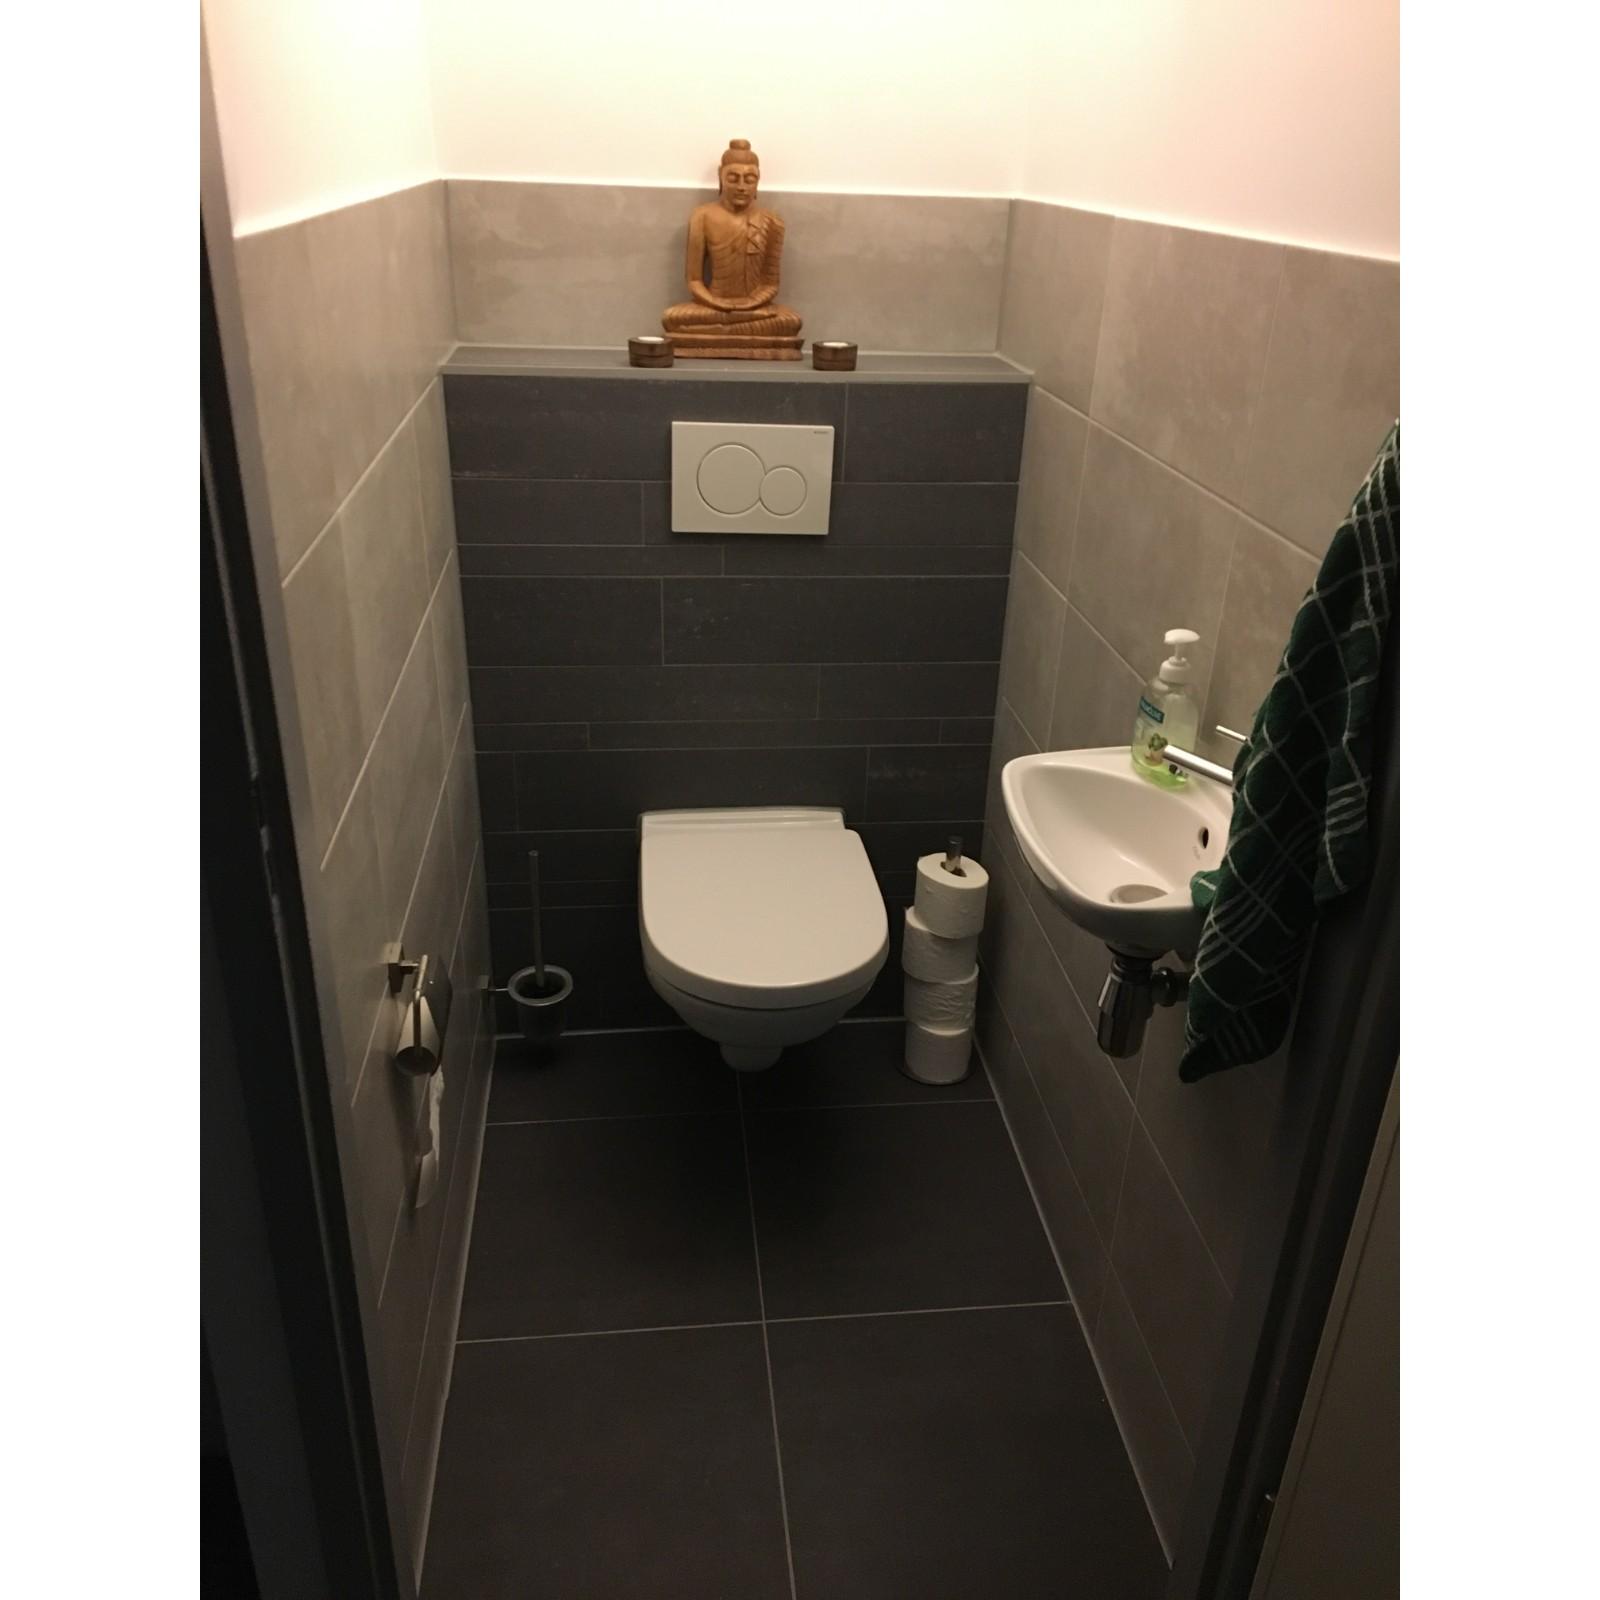 Badkamer en toilet Duivendrecht - Tuijps Tegels, Sanitair en Keukens